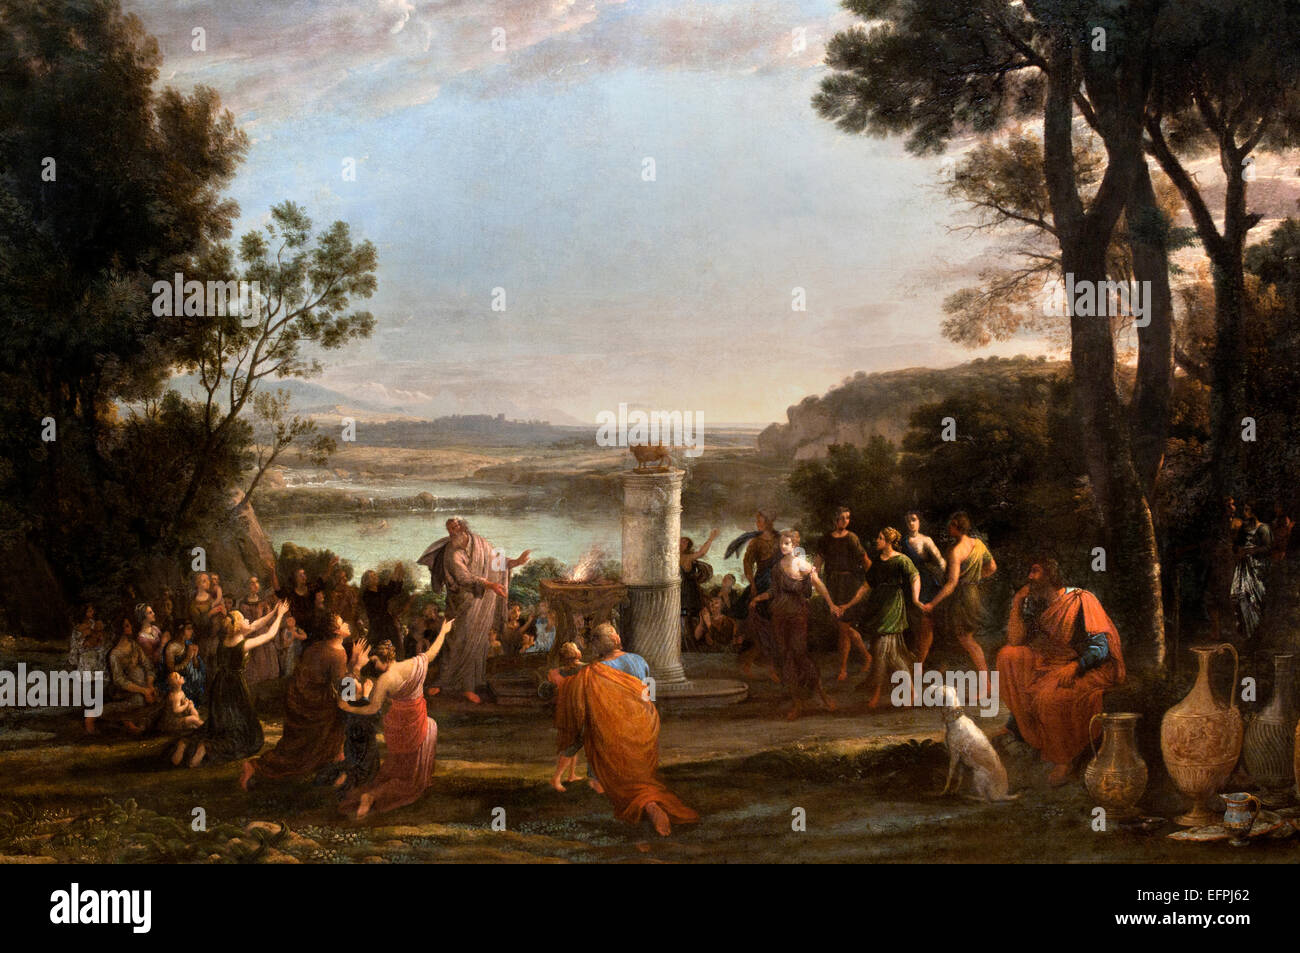 The Adoration of the Golden Calf 1653 Claude Lorrain - Claude Gellée 1604/1605–1682)   France French - Stock Image